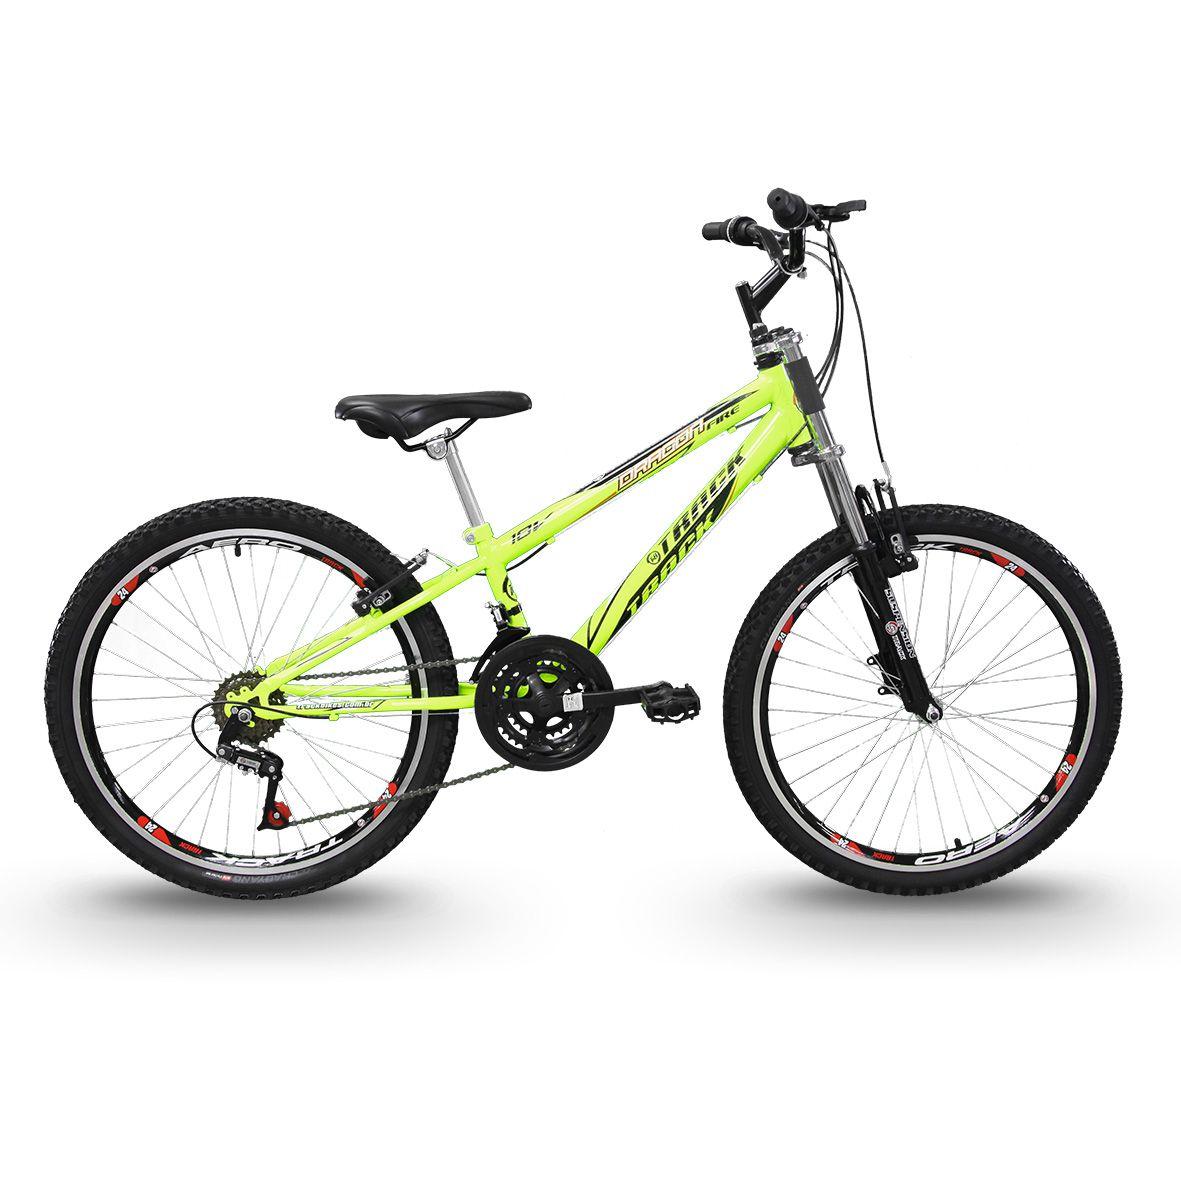 Bicicleta Track Bikes Dragon Fire Juvenil Aro 24